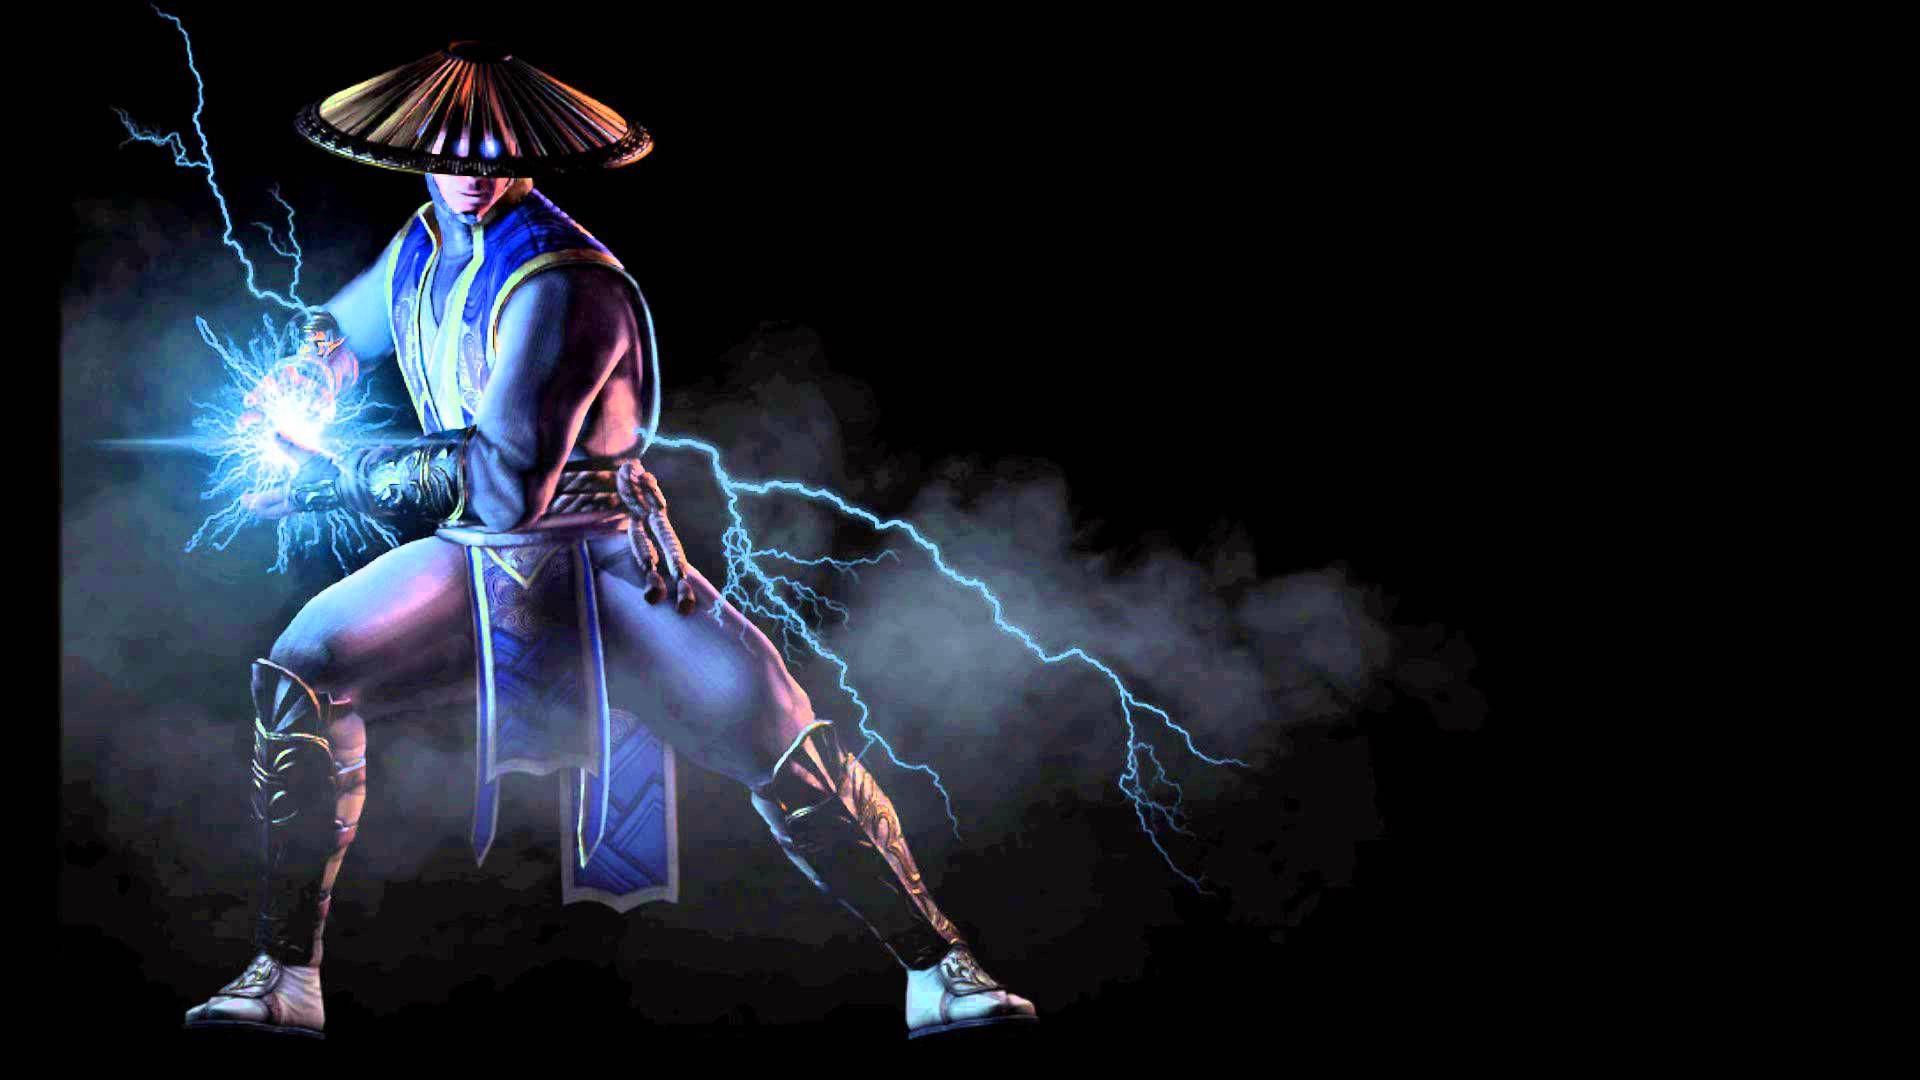 Mortal Kombat X Raiden Loading Screen Render Hd Mortal Kombat X Wallpapers Raiden Mortal Kombat Mortal Kombat X